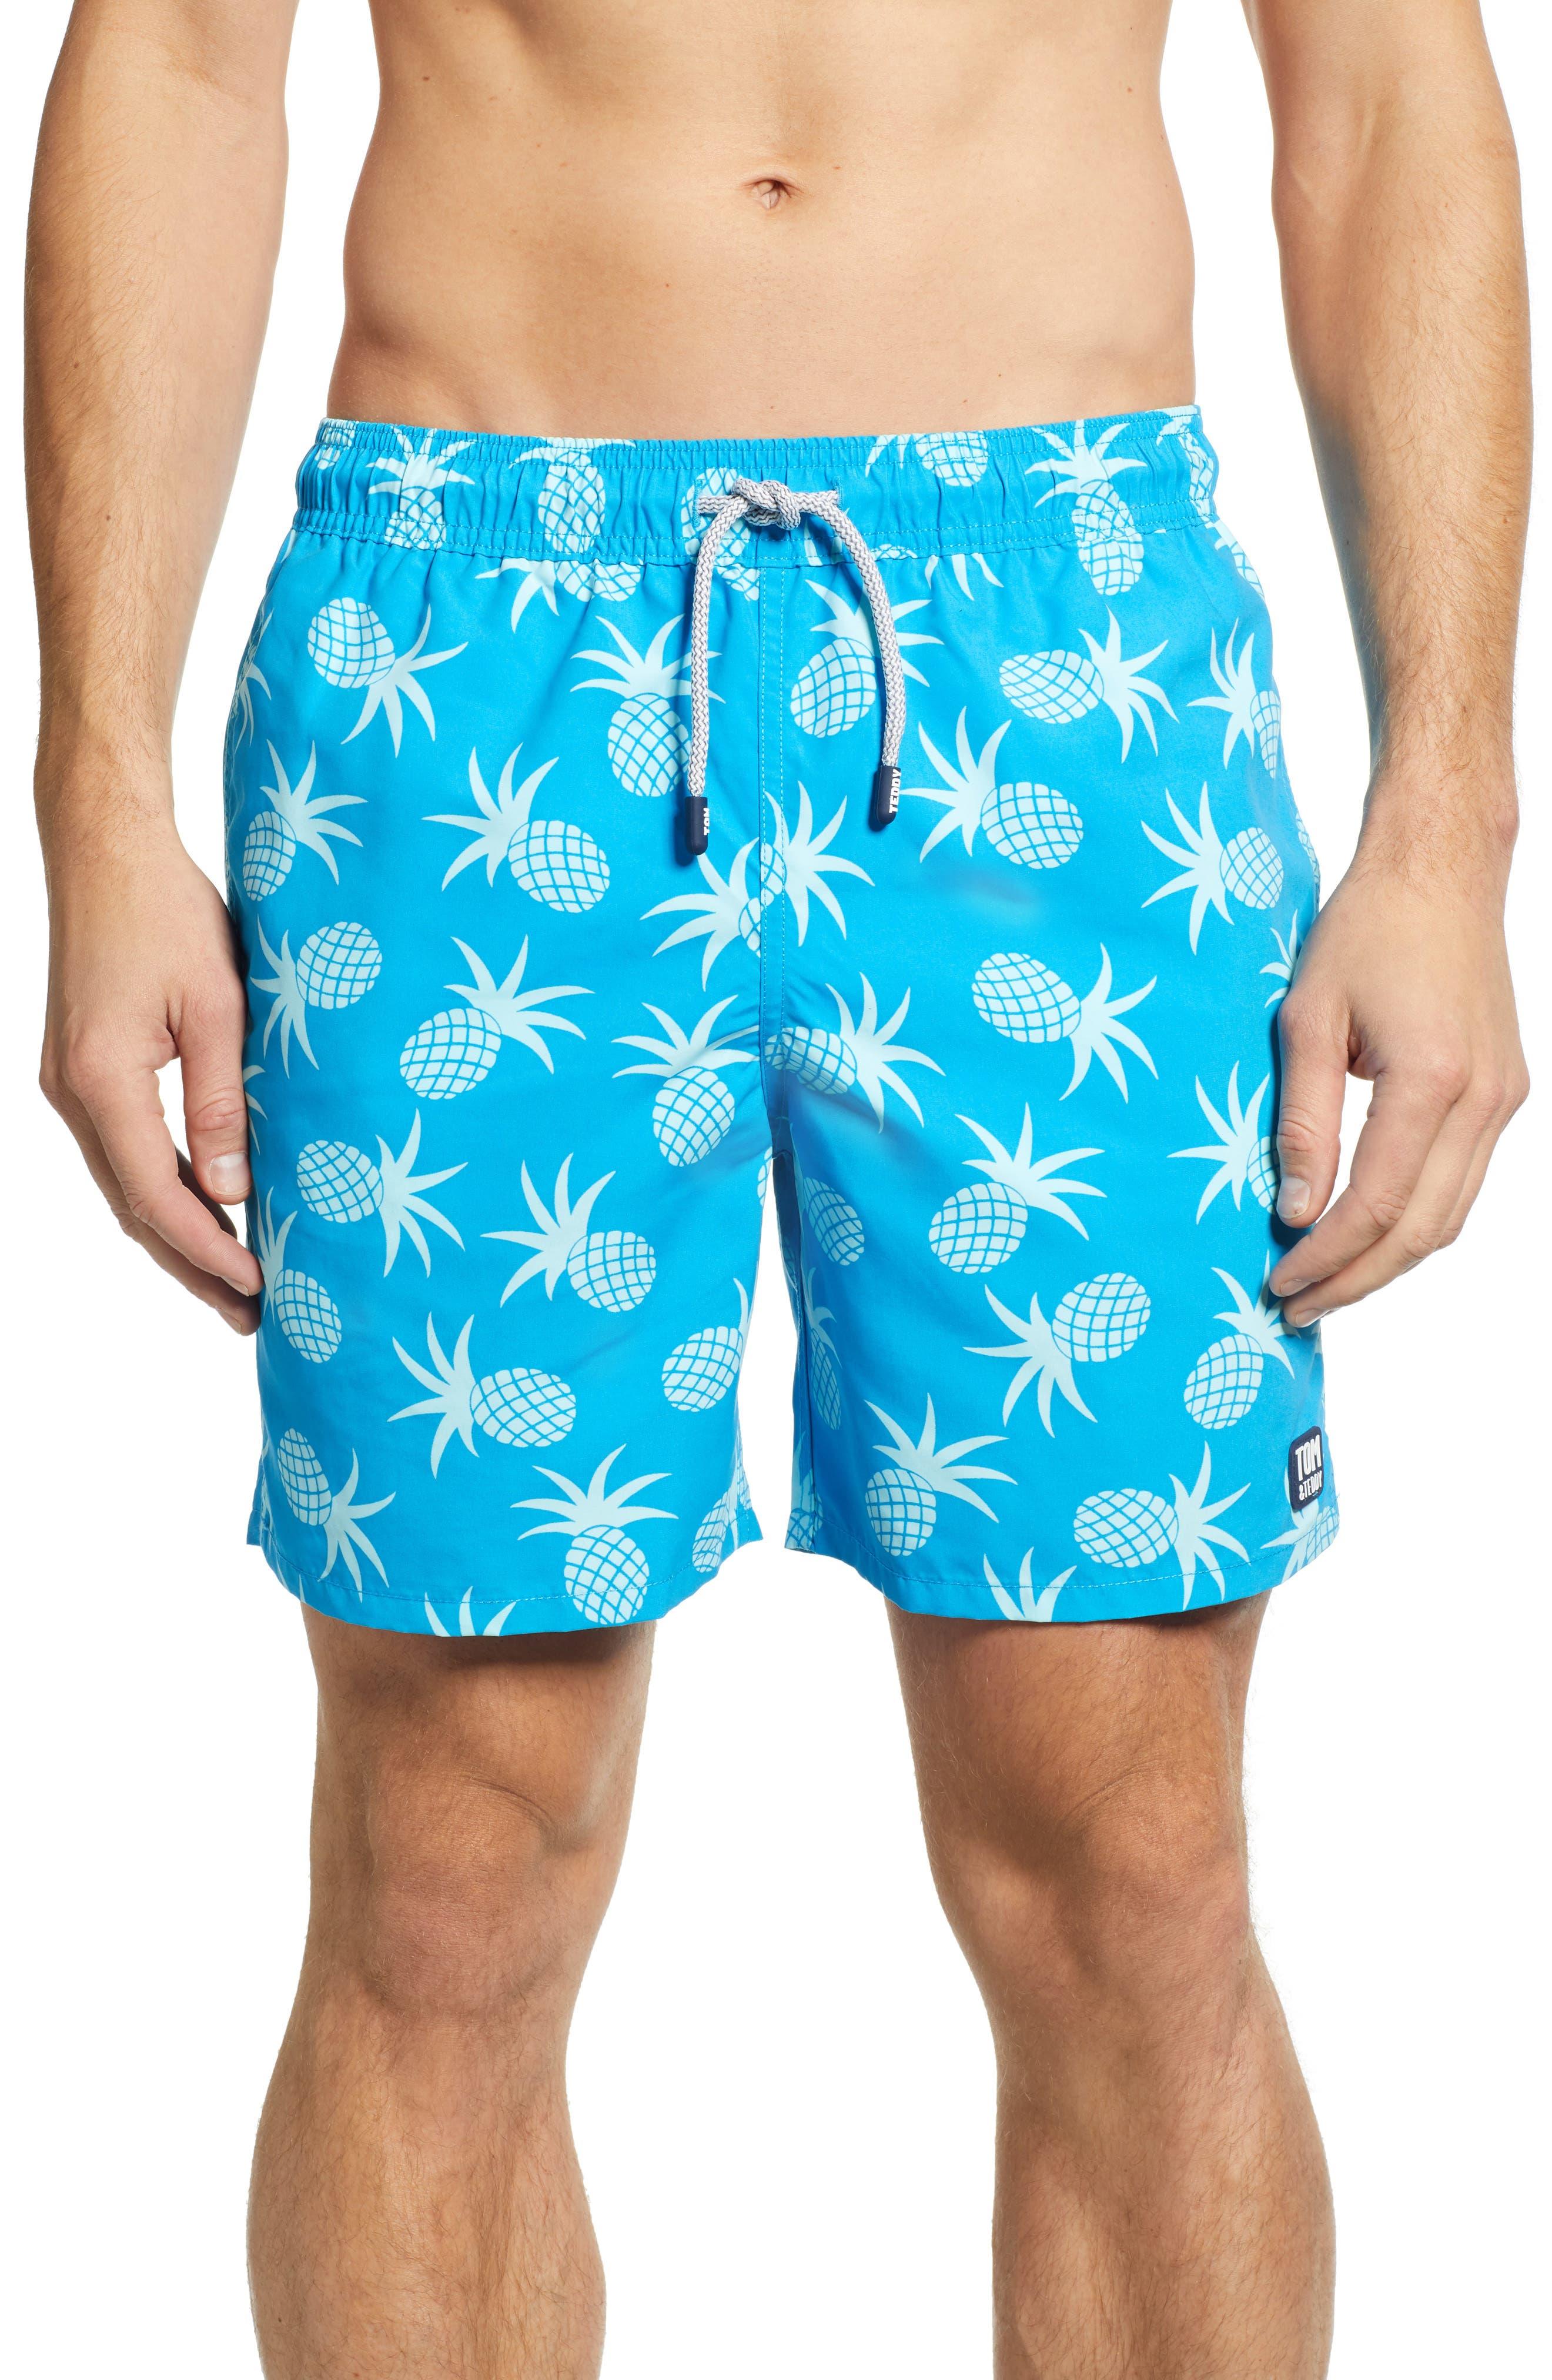 Tom & Teddy Pineapple Print Swim Trunks, Blue